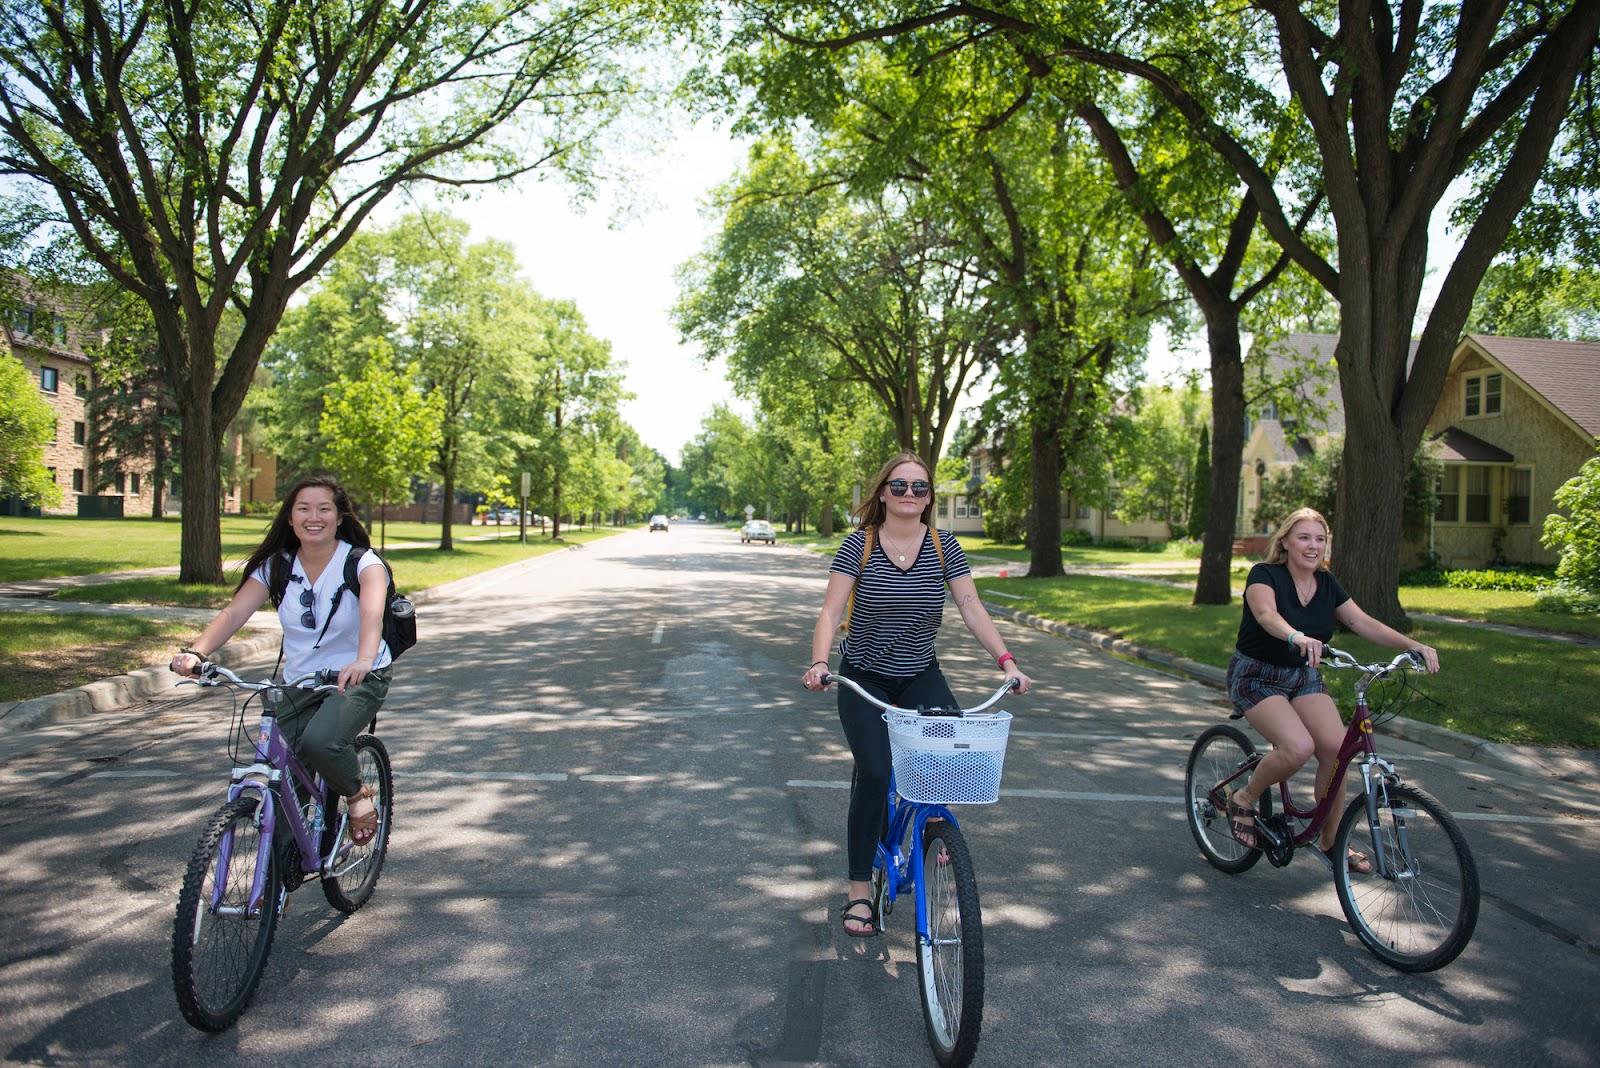 Three young women riding bikes down a street.